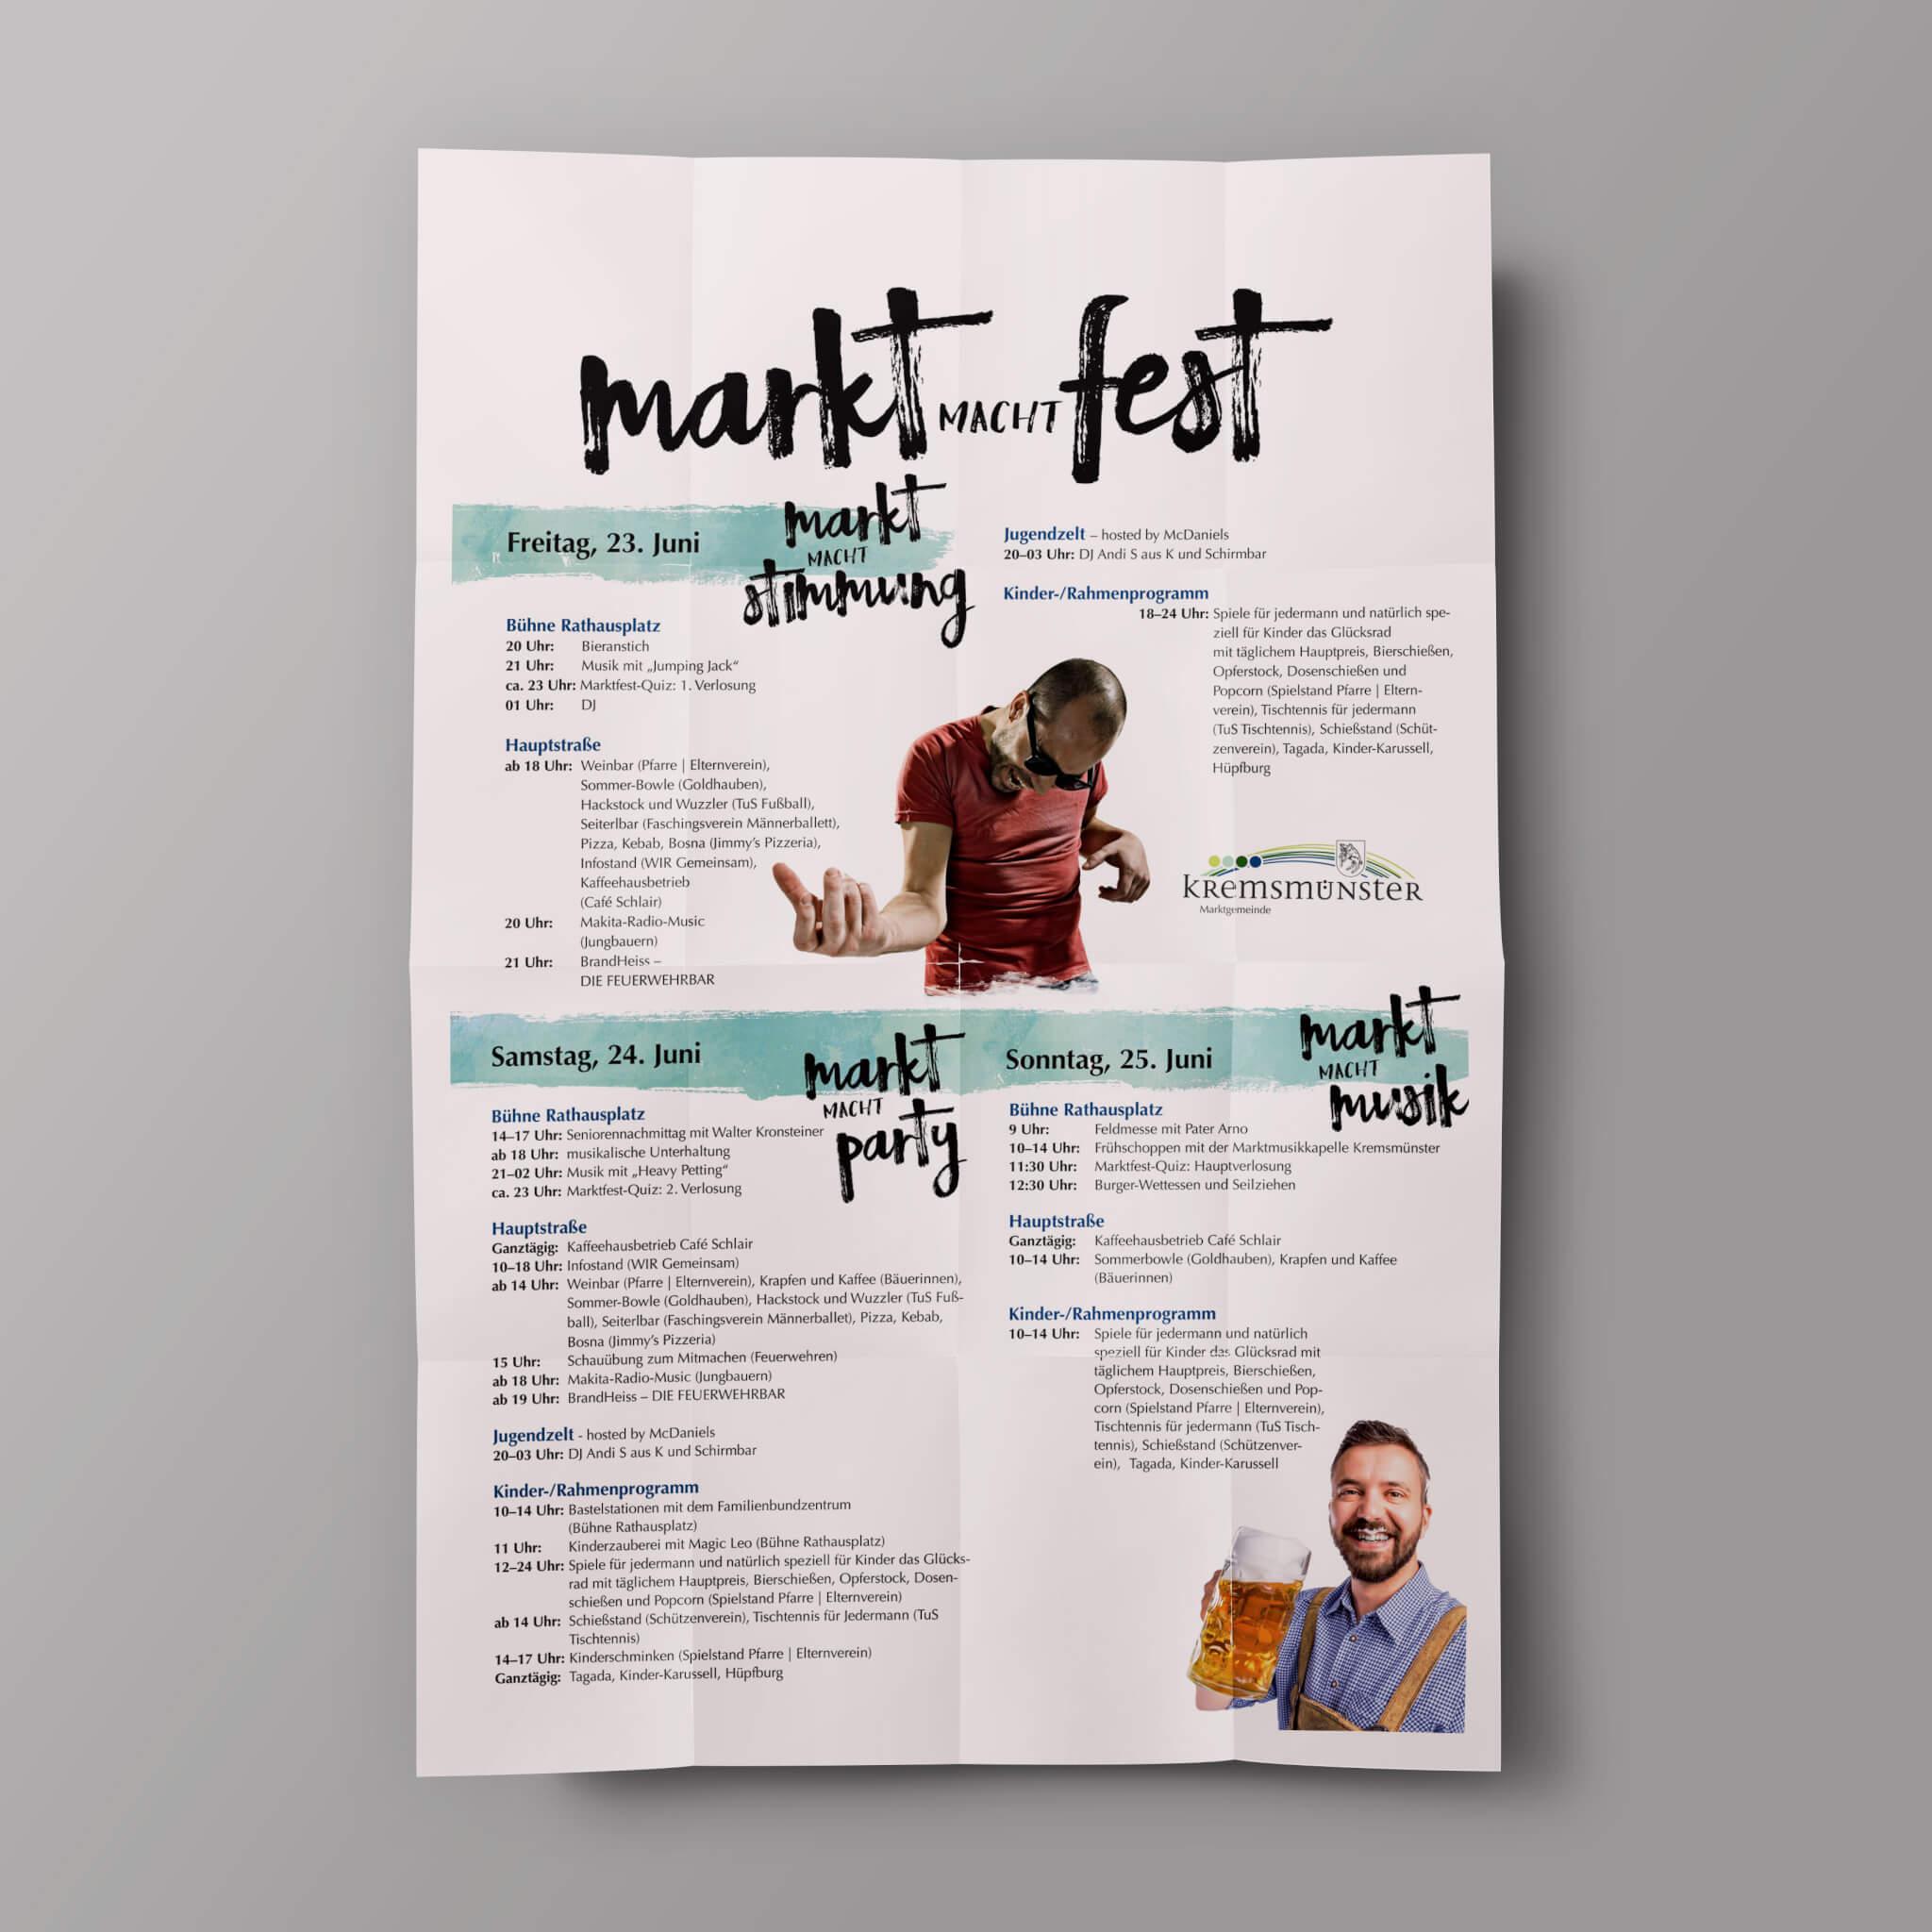 Marktfest3